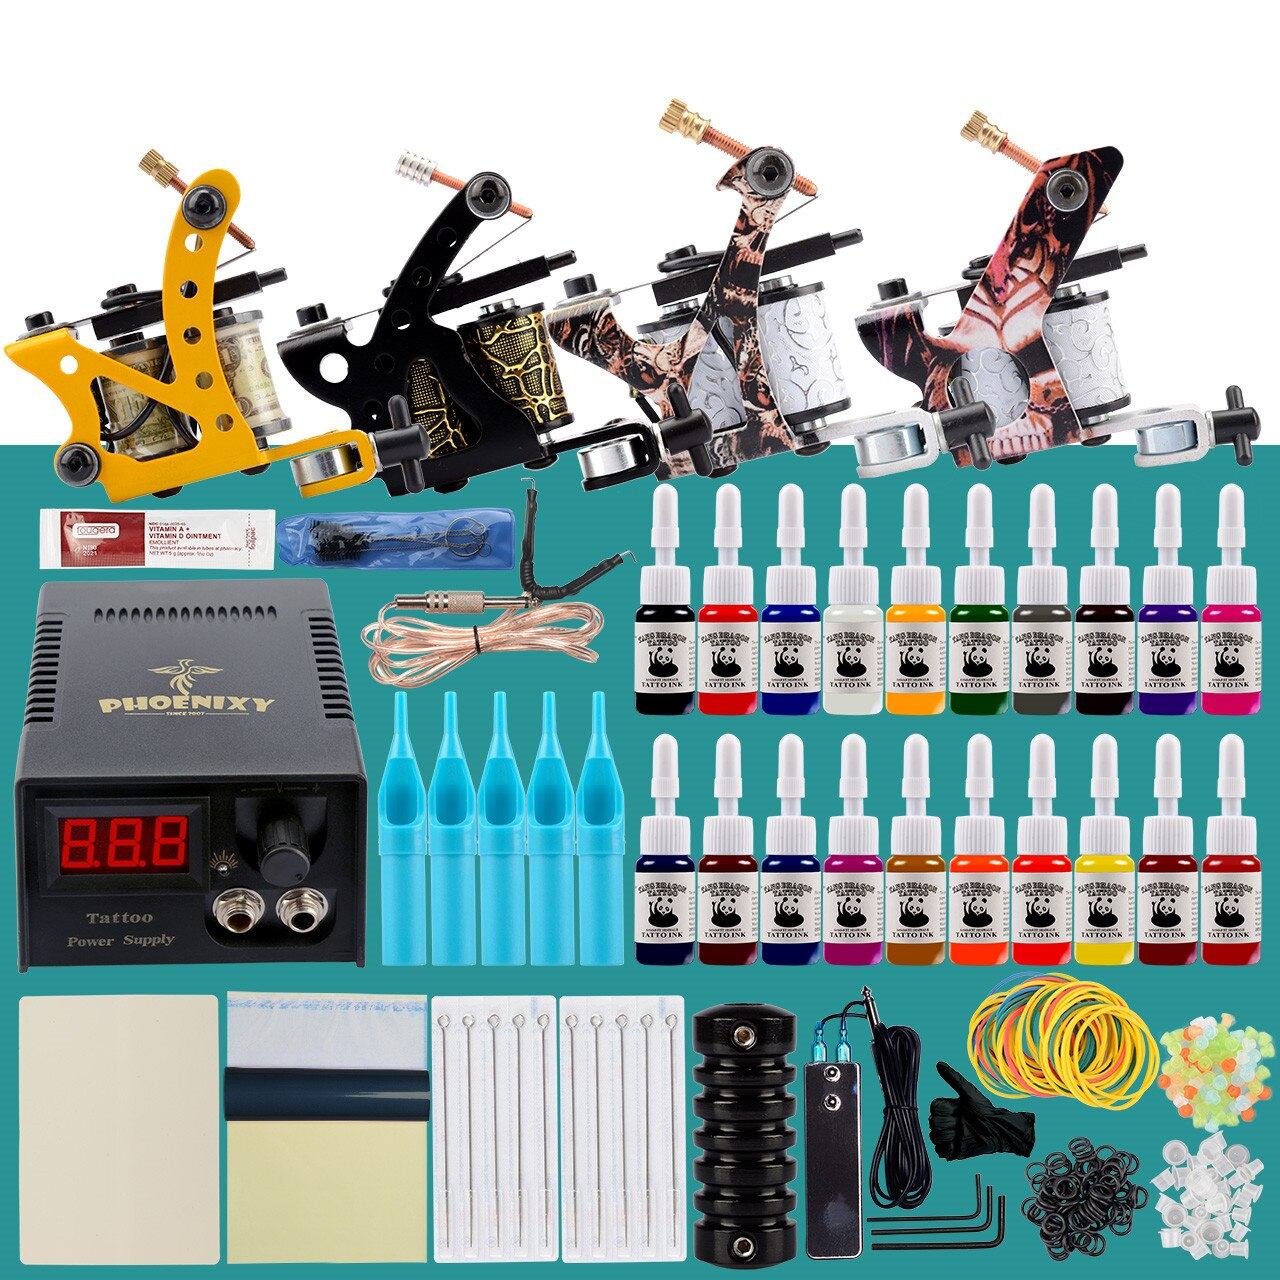 Professional Tattoo Kit Tattoo Machines Set Coil Guns LCD Power Supply Permanent Ink Tattoo Equipment Makeup Complete Tattoo Set